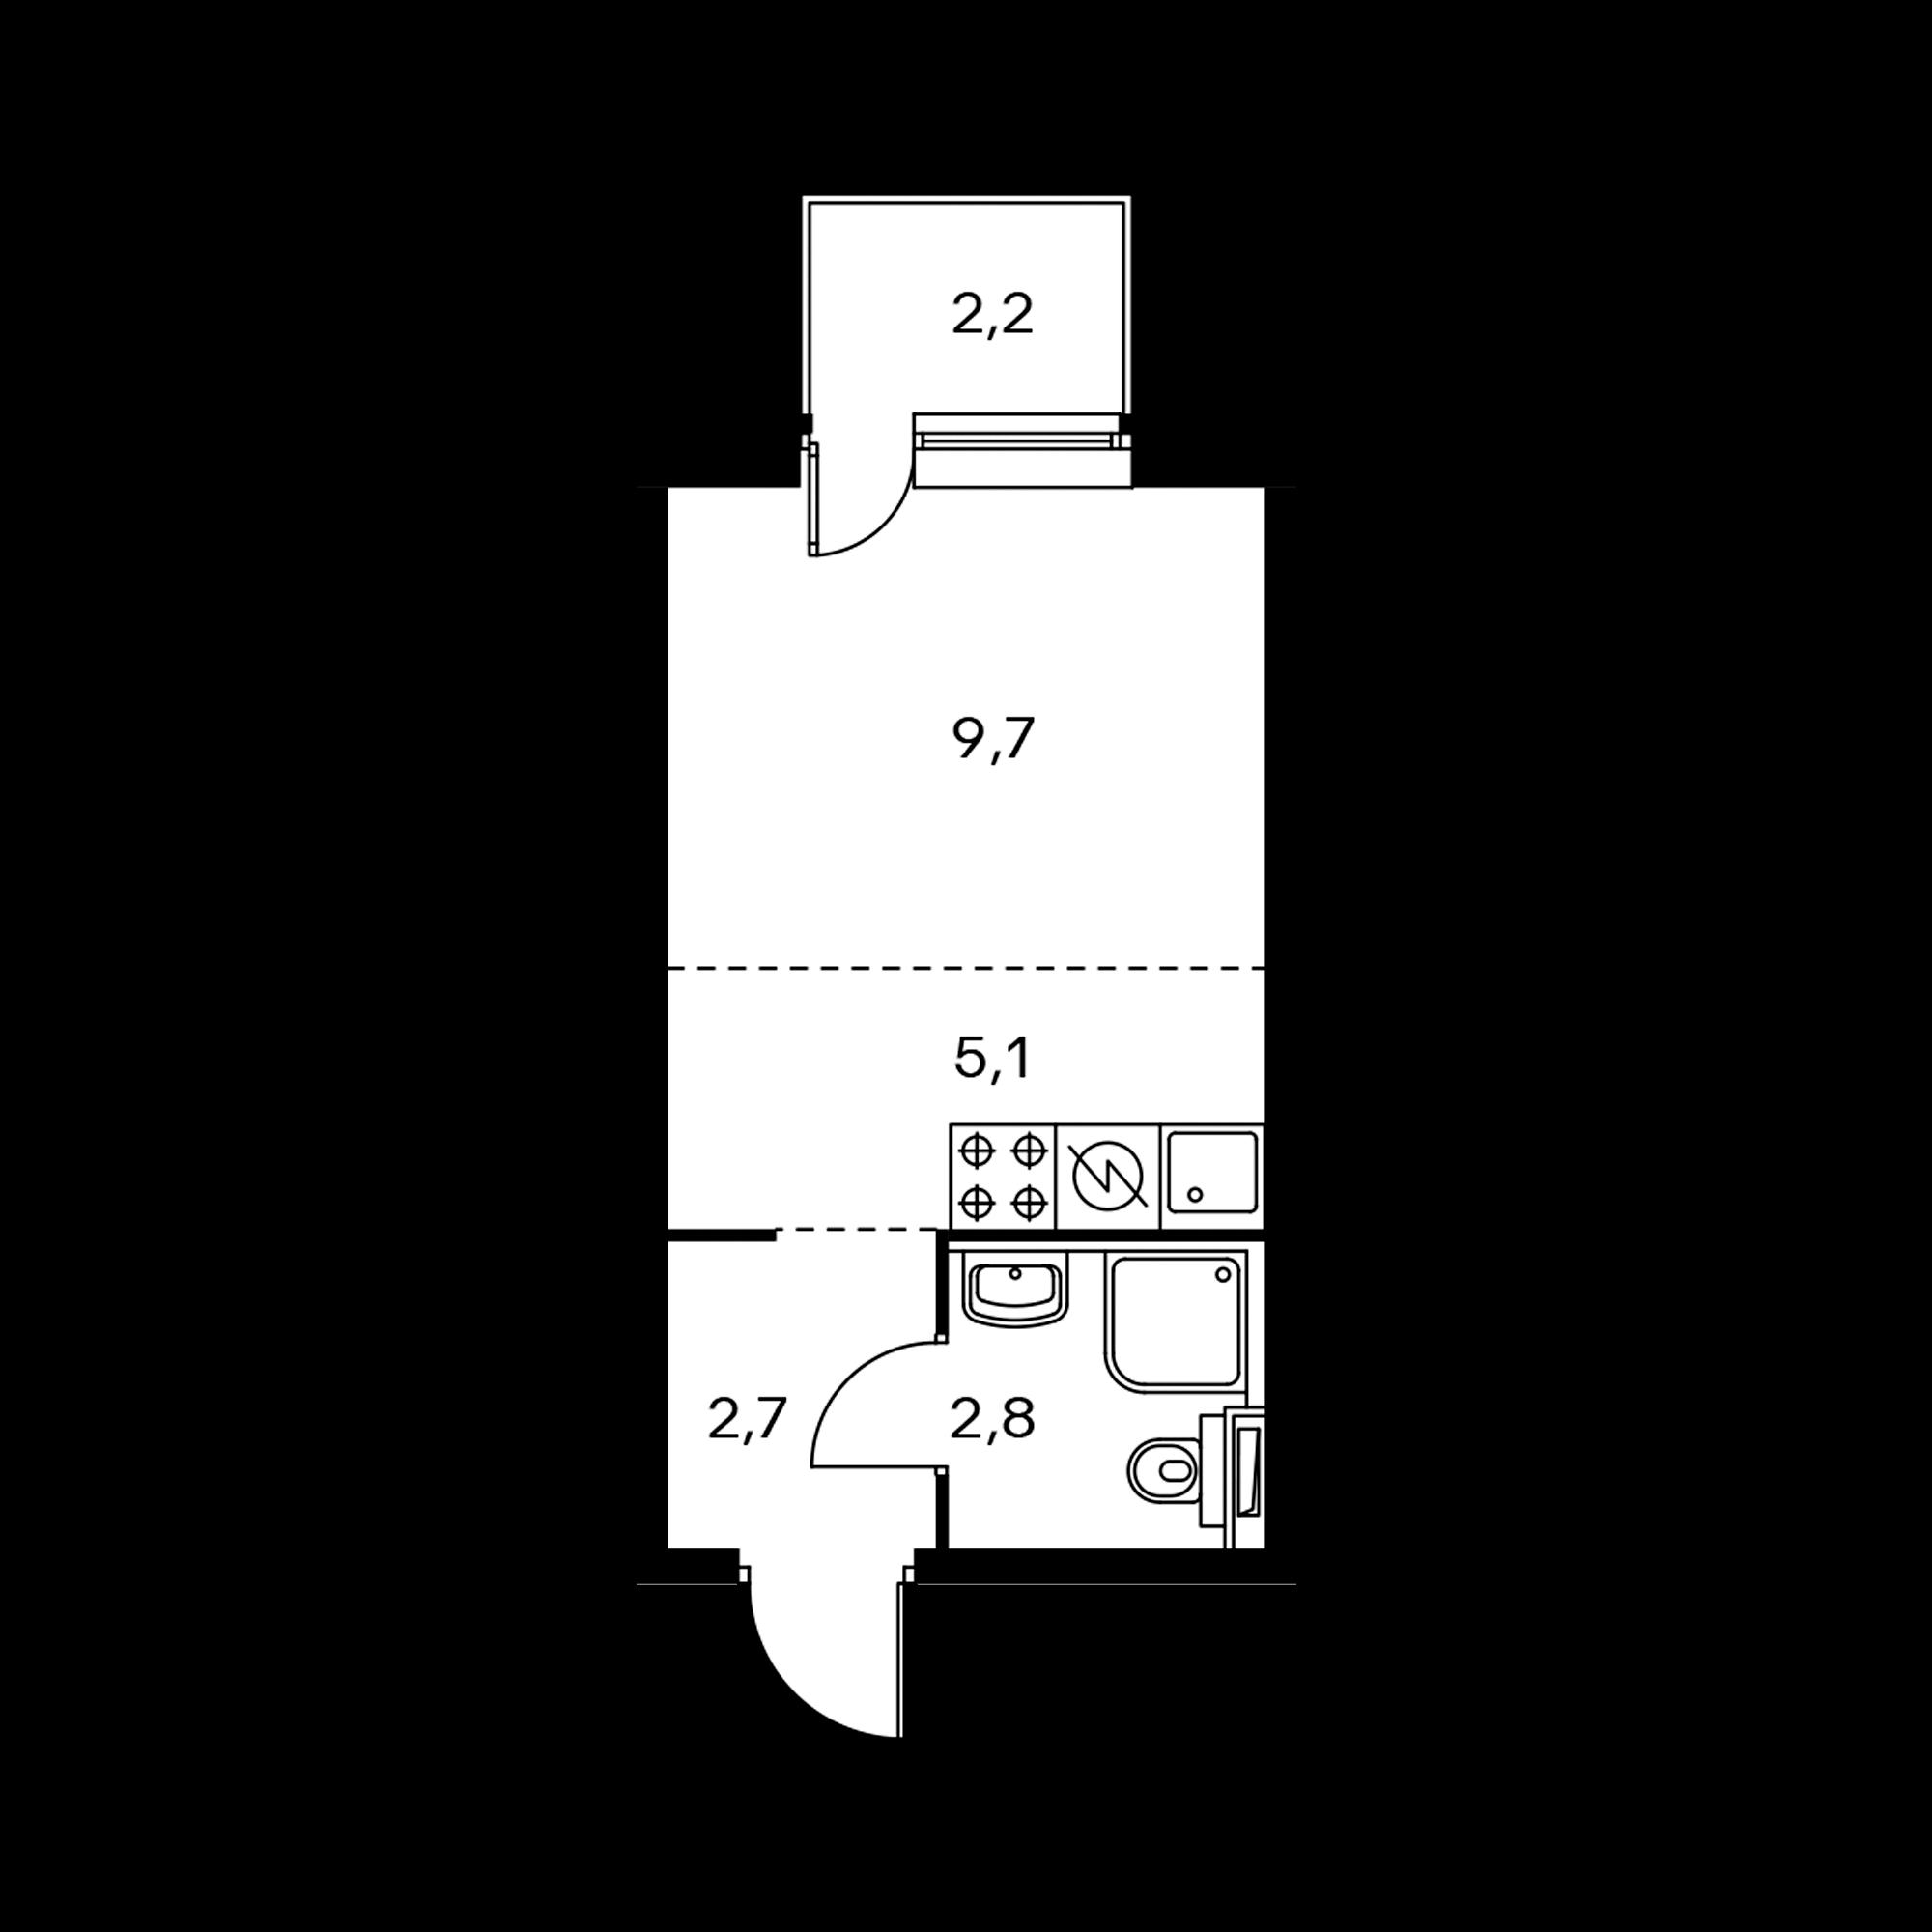 1NS1_3.6-1_S_AB1*